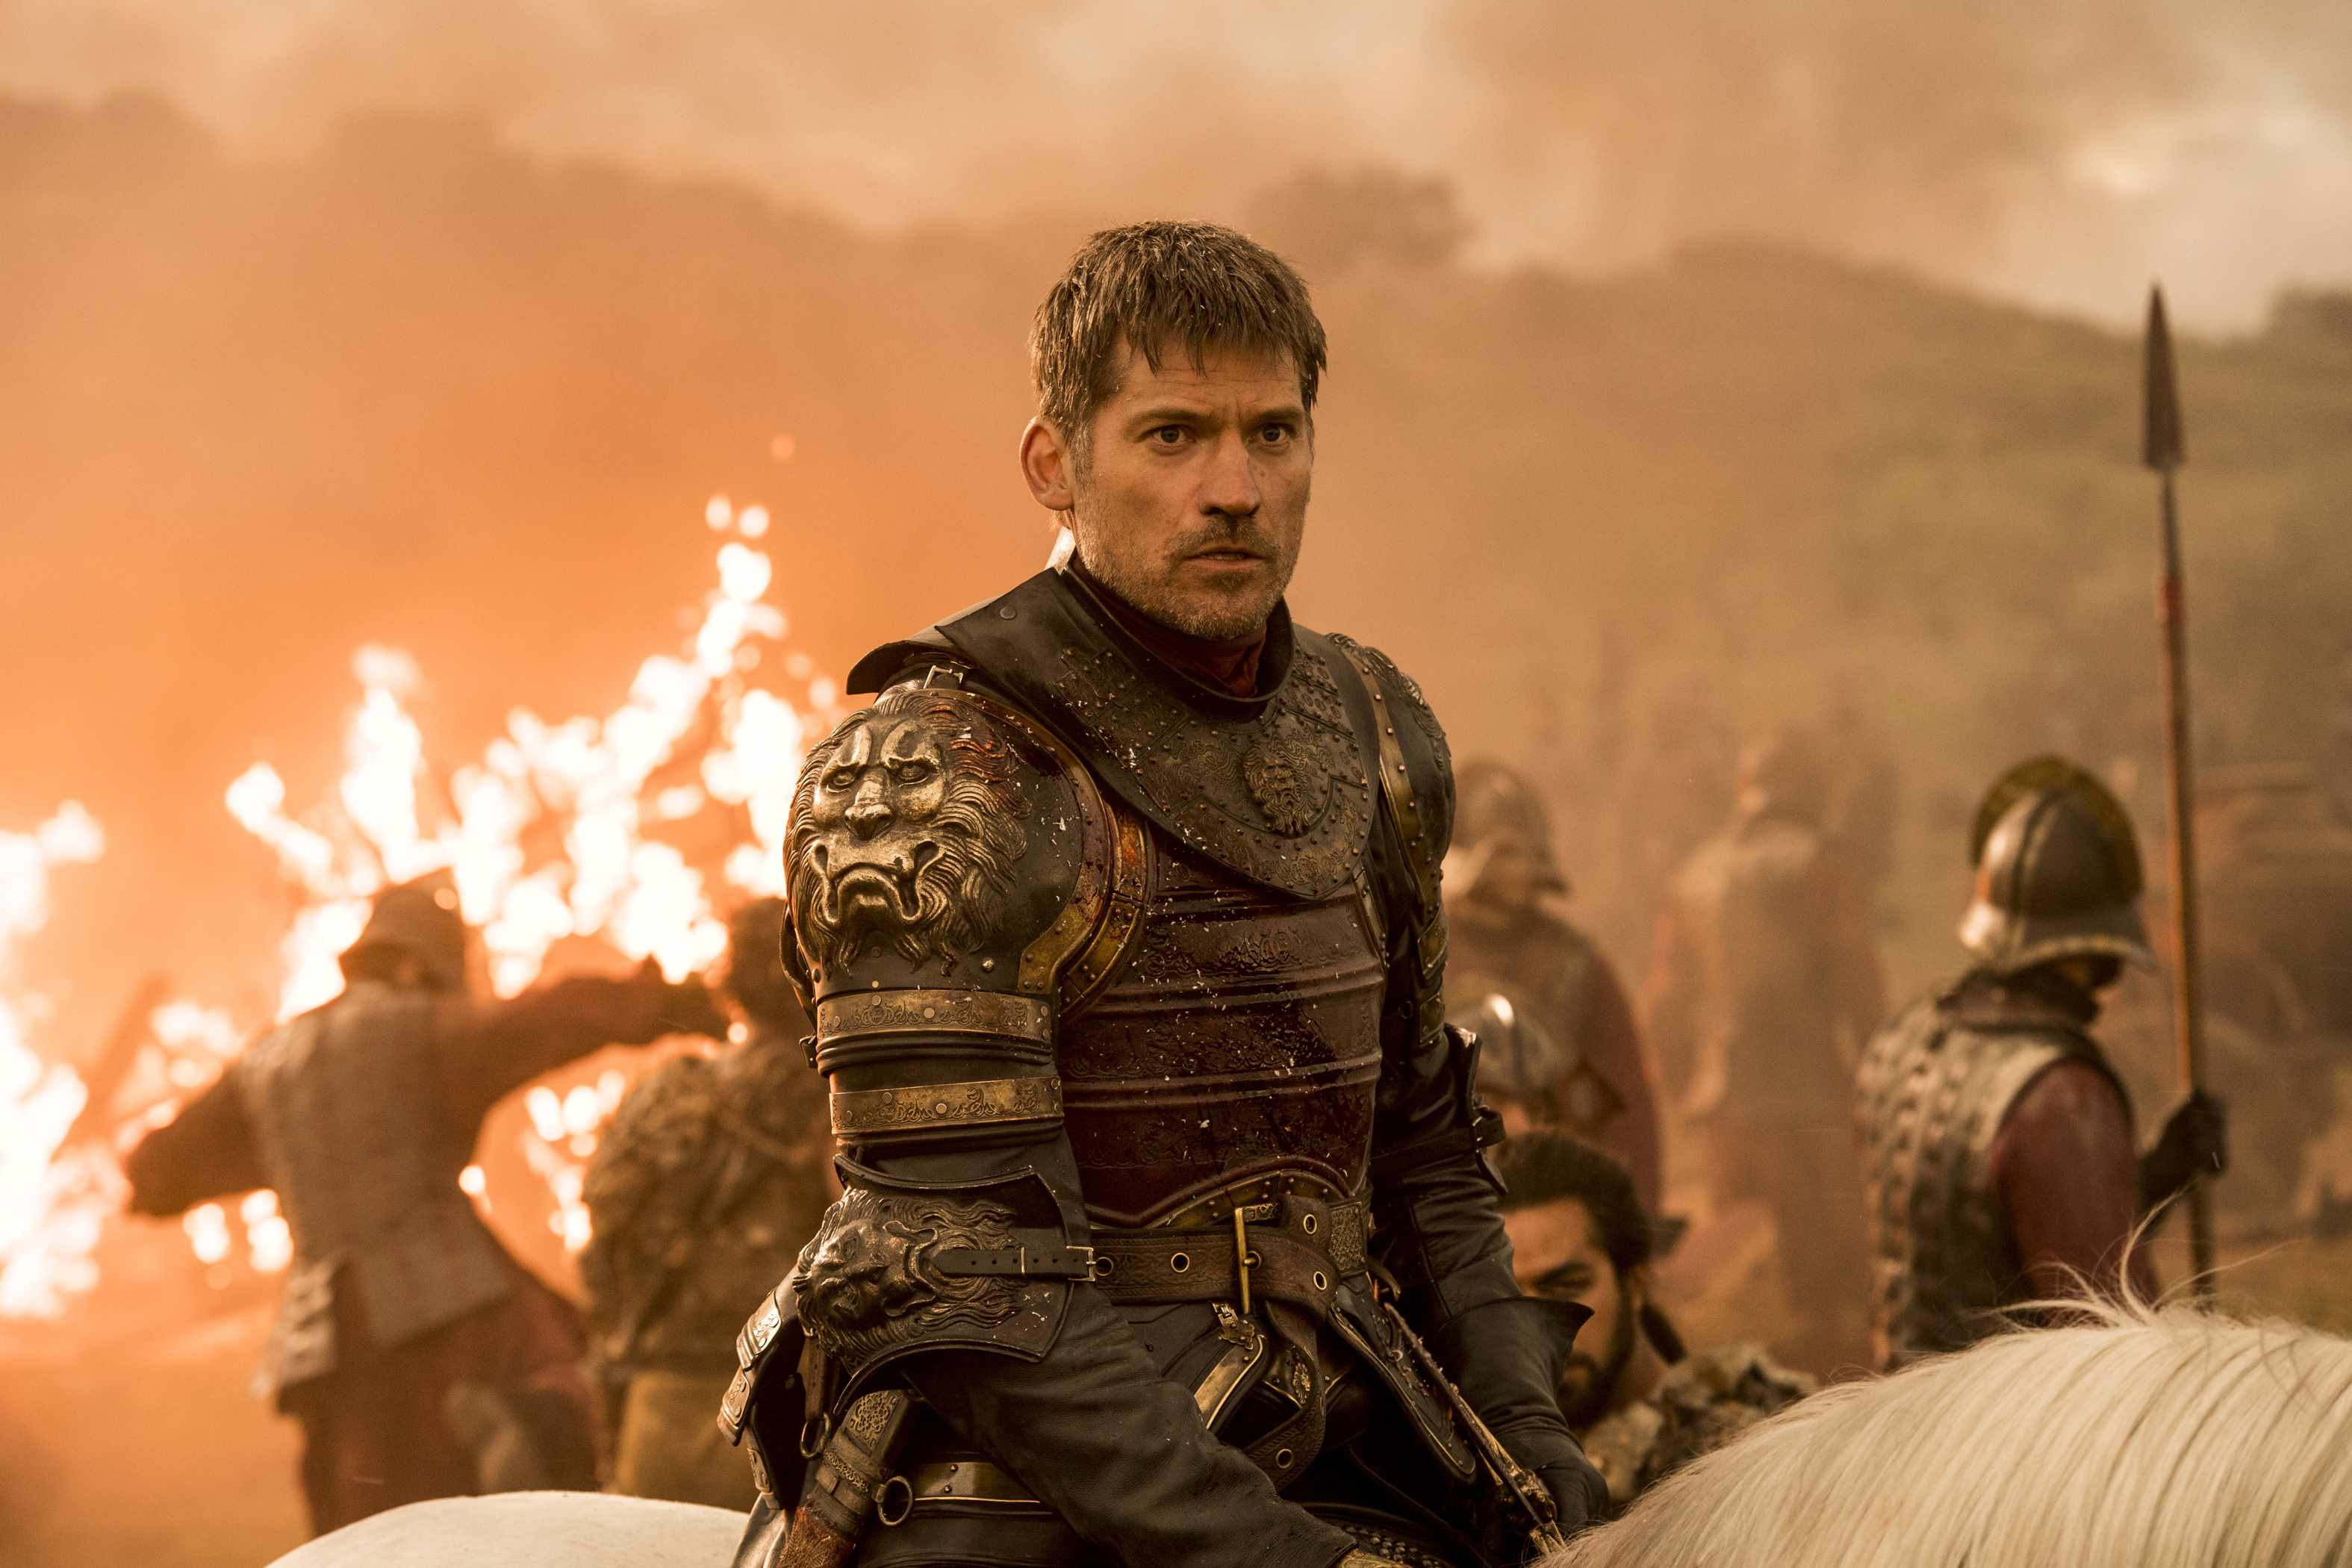 Nikolaj Coster-Waldau as Jaime Lannister (HBO, Sky pics, TL)